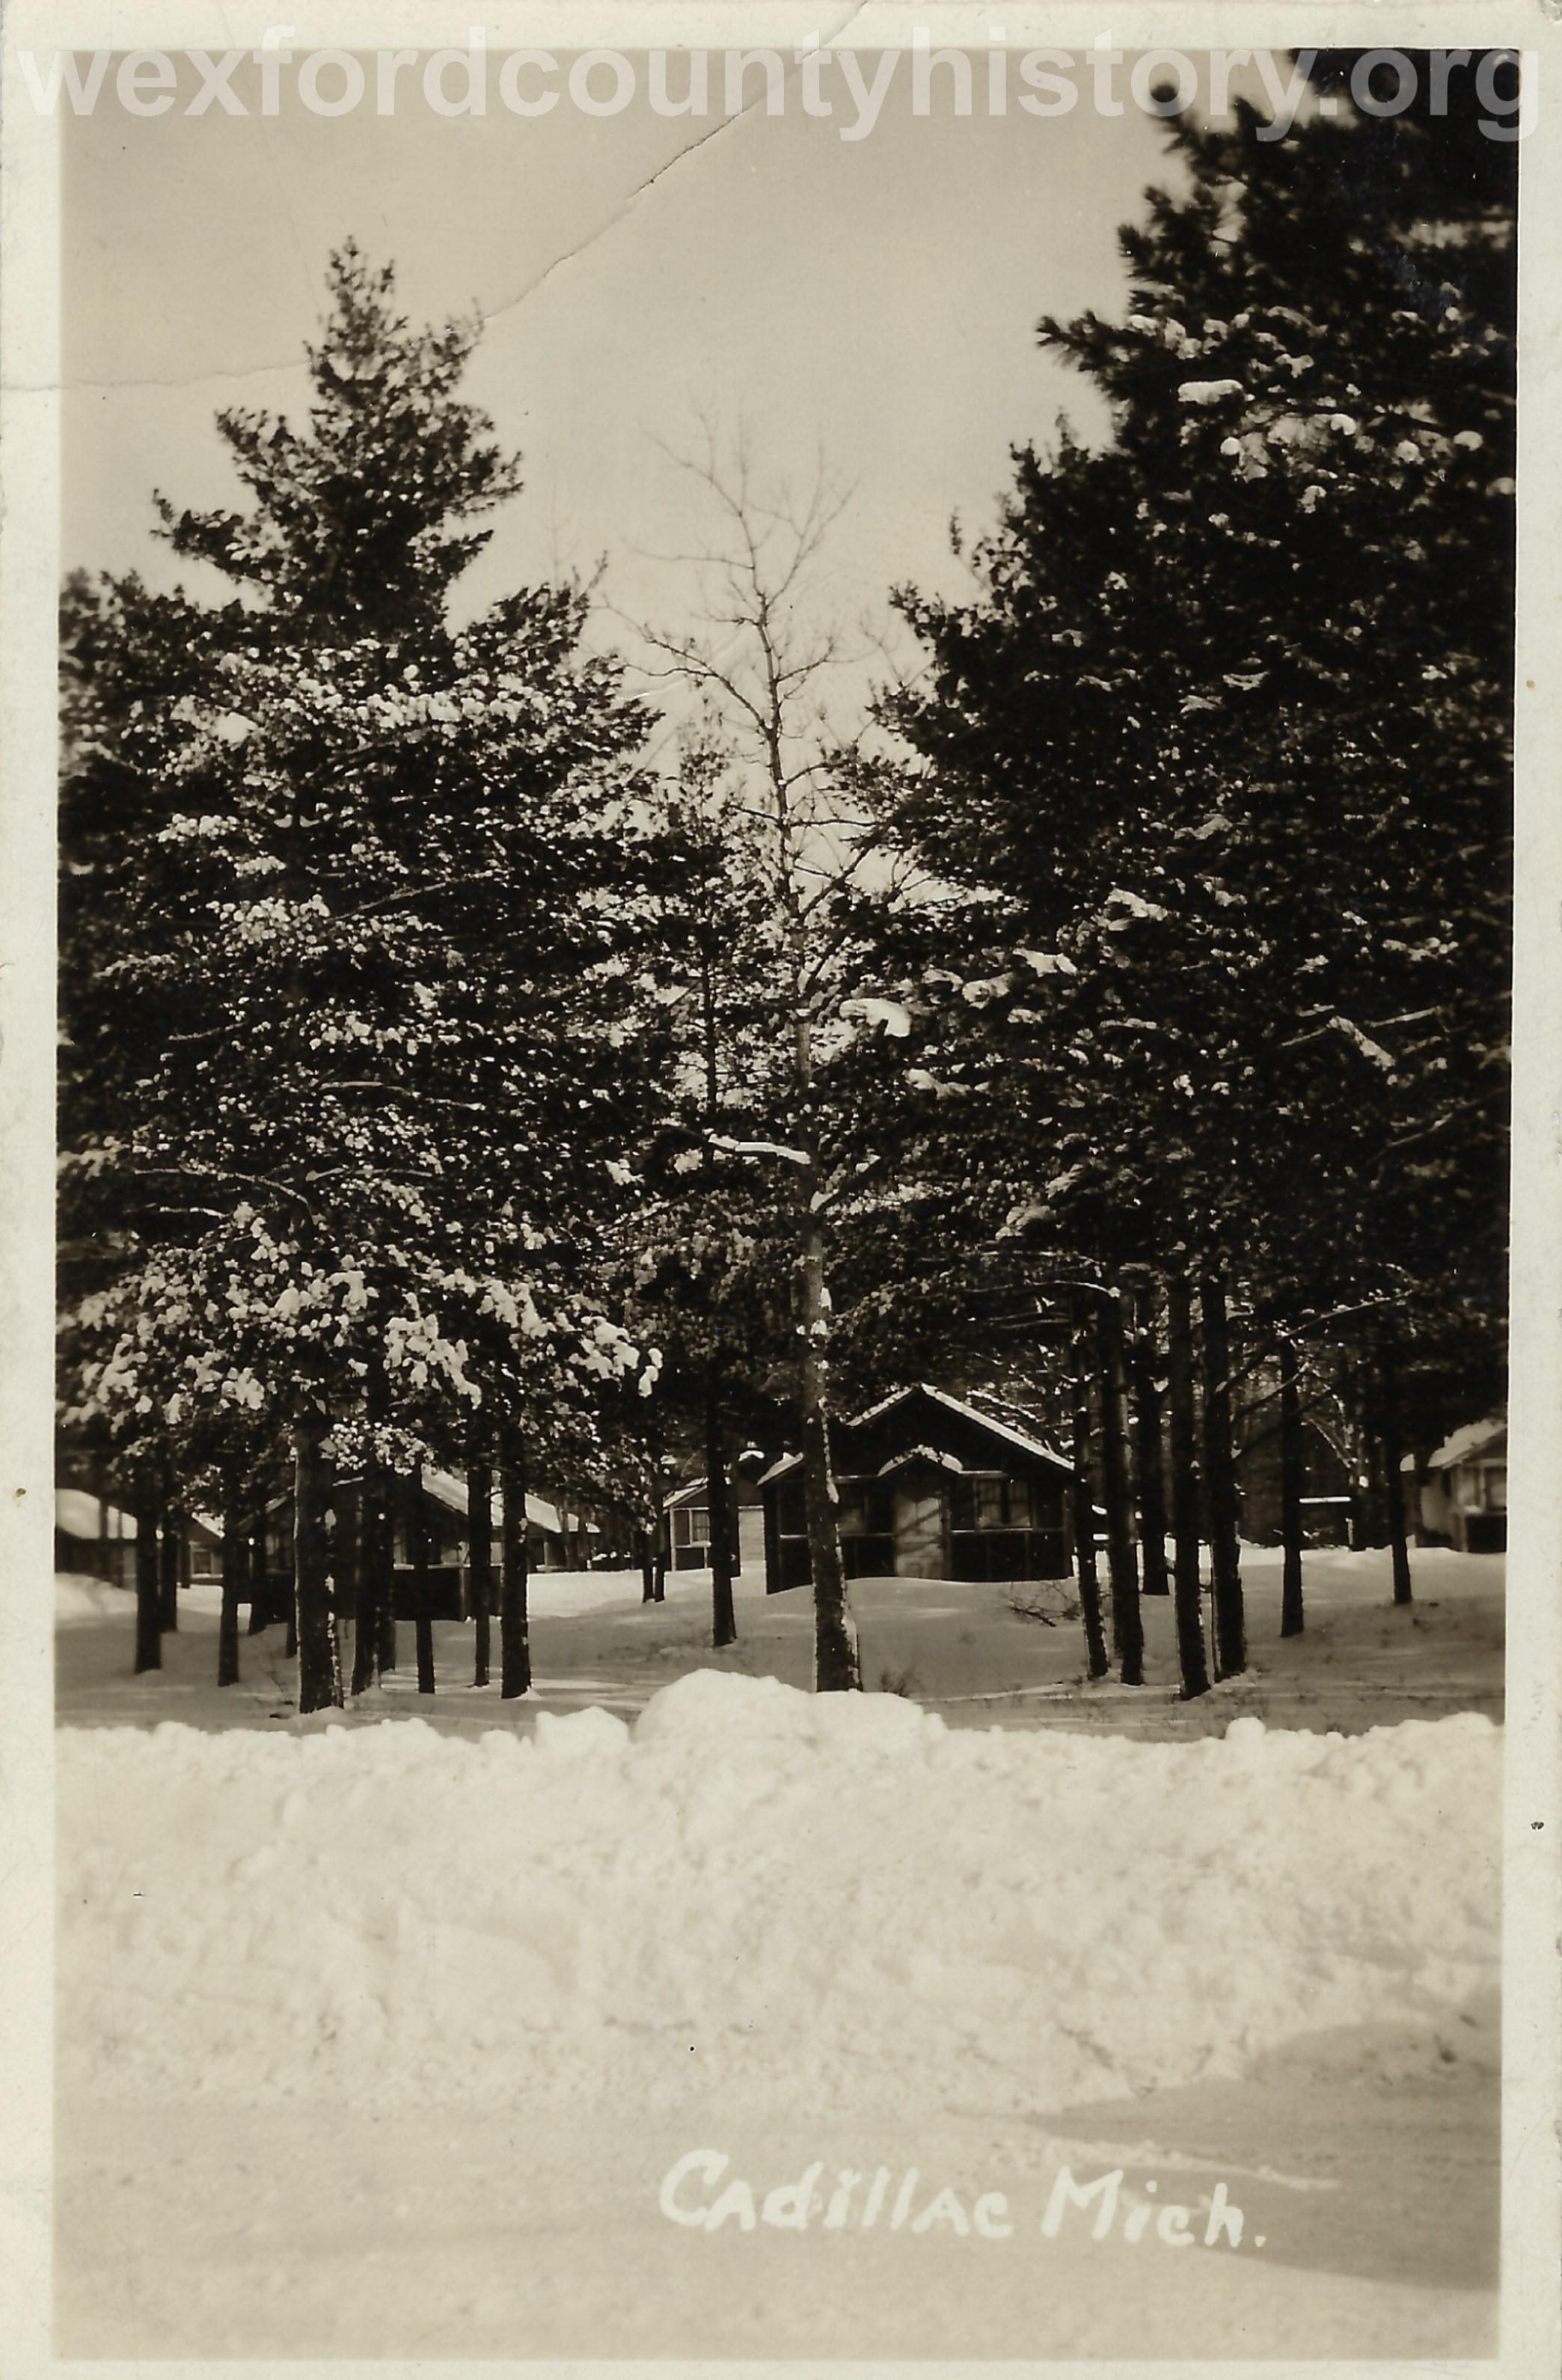 Cadillac-Weather-Winter-Scene-12